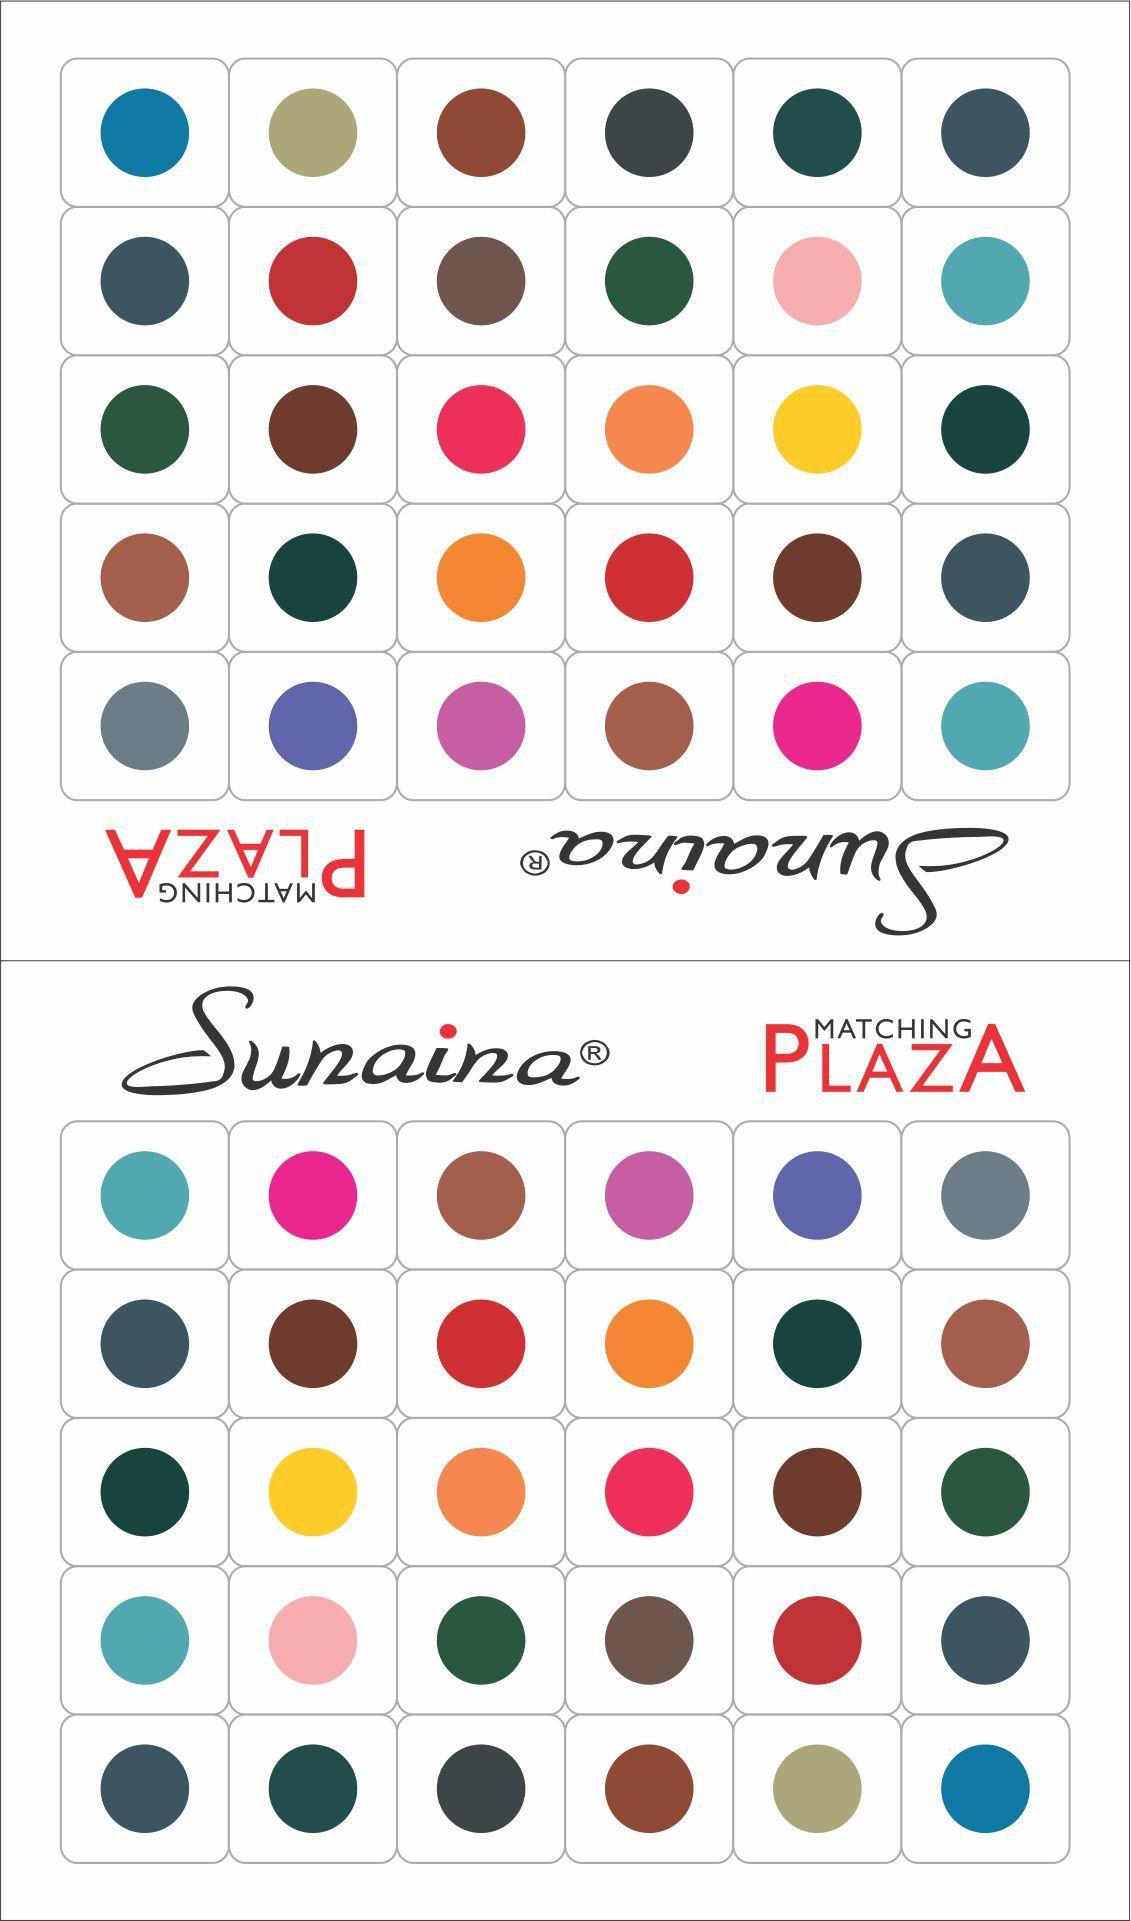 Sunaina Matching Plaza Size-4 FOREHEAD Multicolor Bindis(Fancy Design)